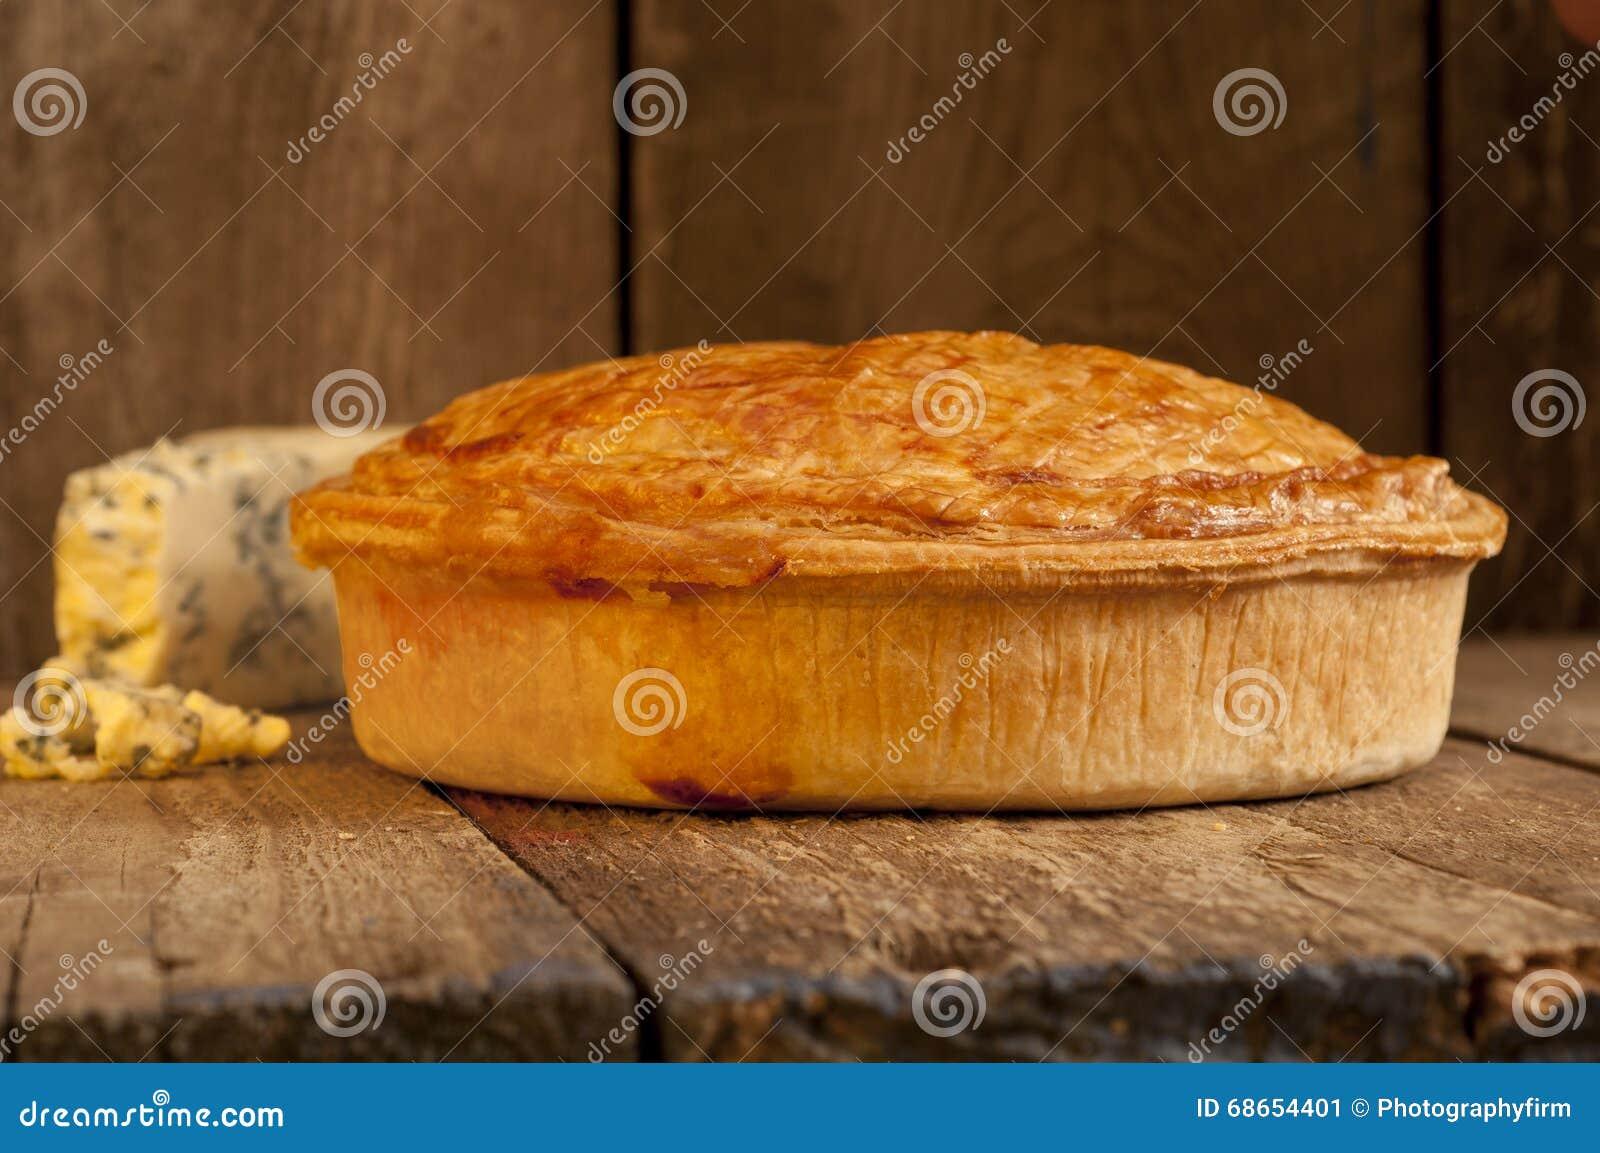 Watch How to Make Melton Mowbray Pork Pie video